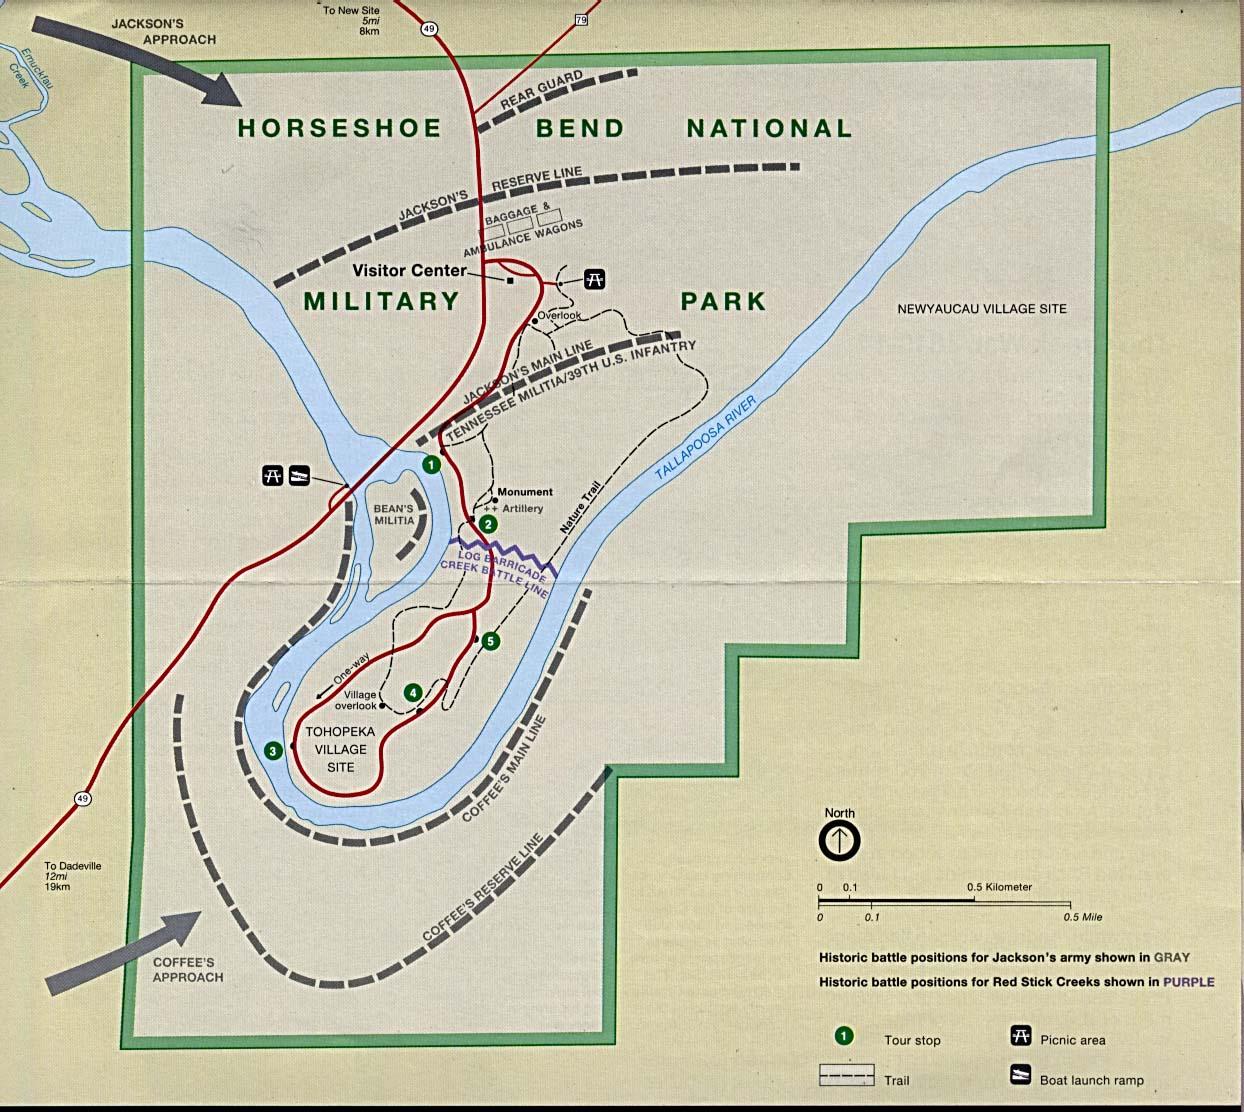 Horseshoe Bend Map